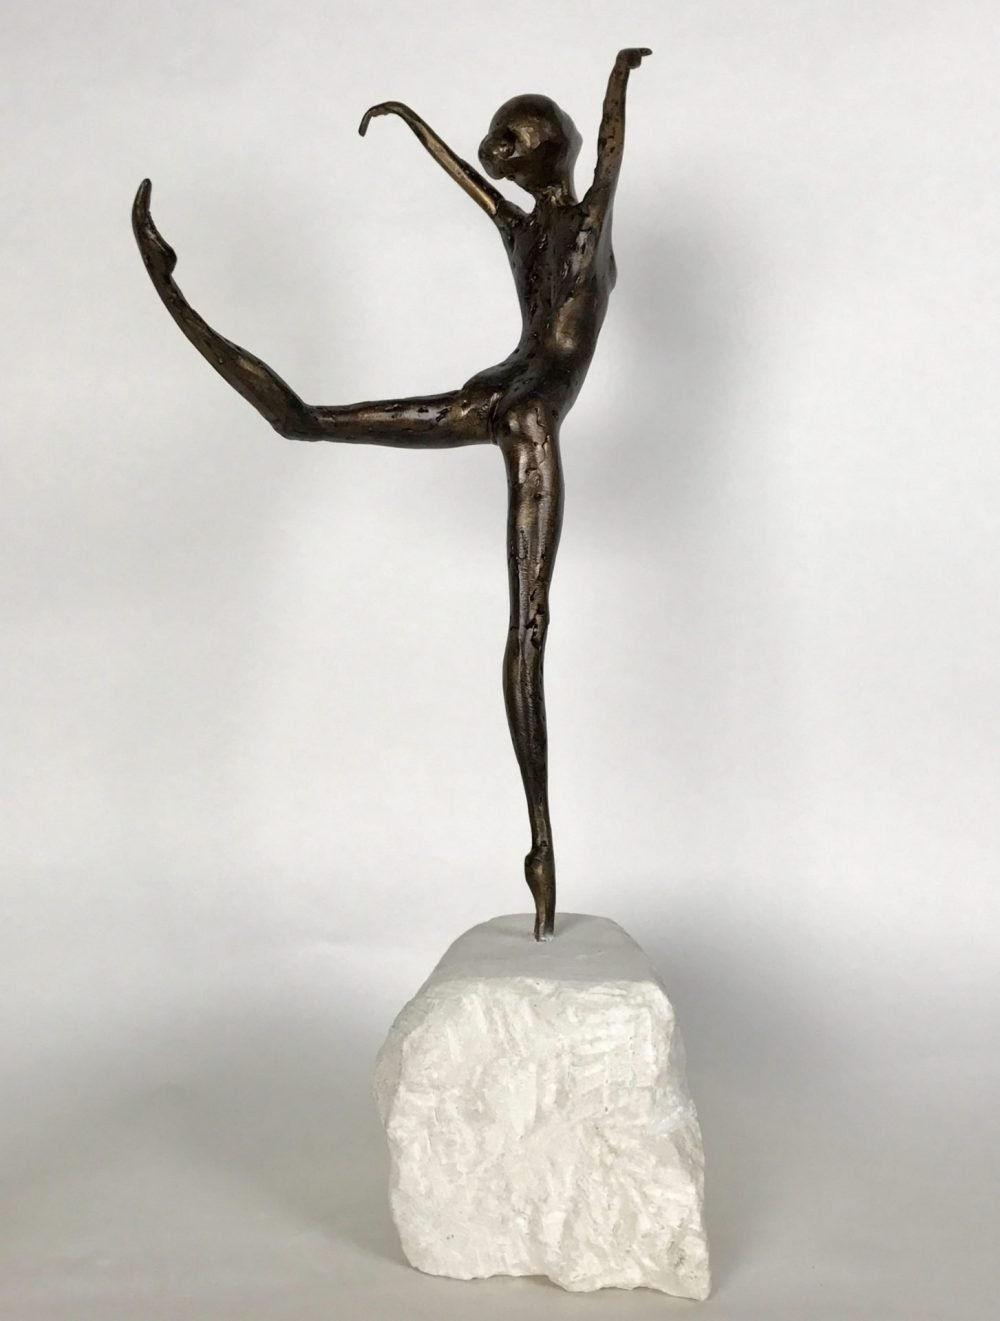 Bronze Coryphee Sculpture against white background